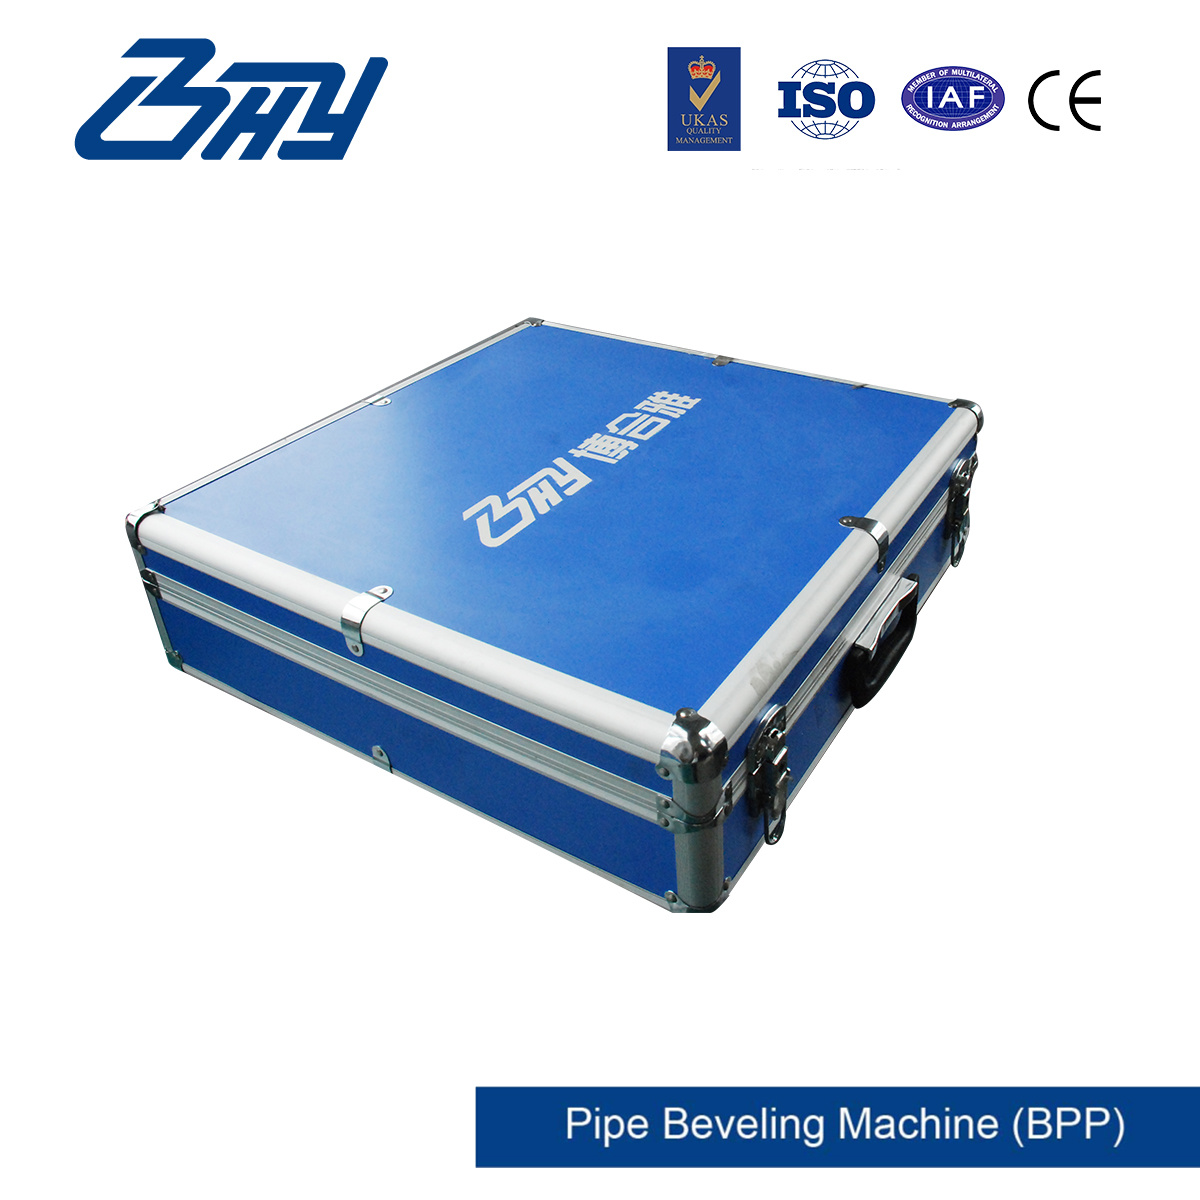 Portable Pipe Beveling Machine/Pipe Beveler (BPP2P)